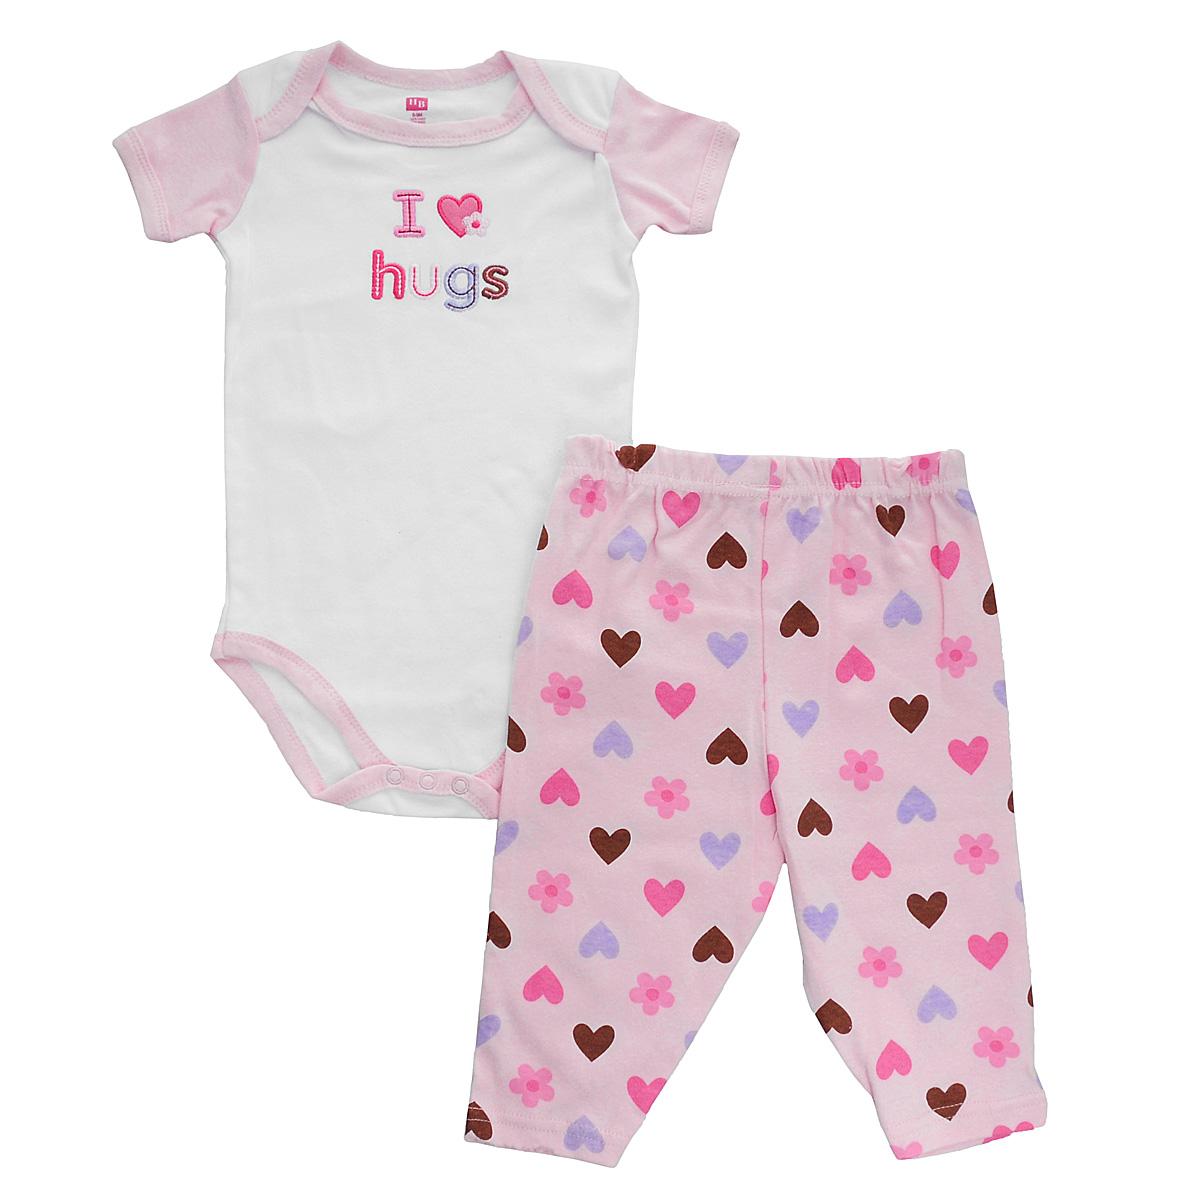 Hudson Baby Комплект для девочки Пирожное: боди, штанишки. 50350